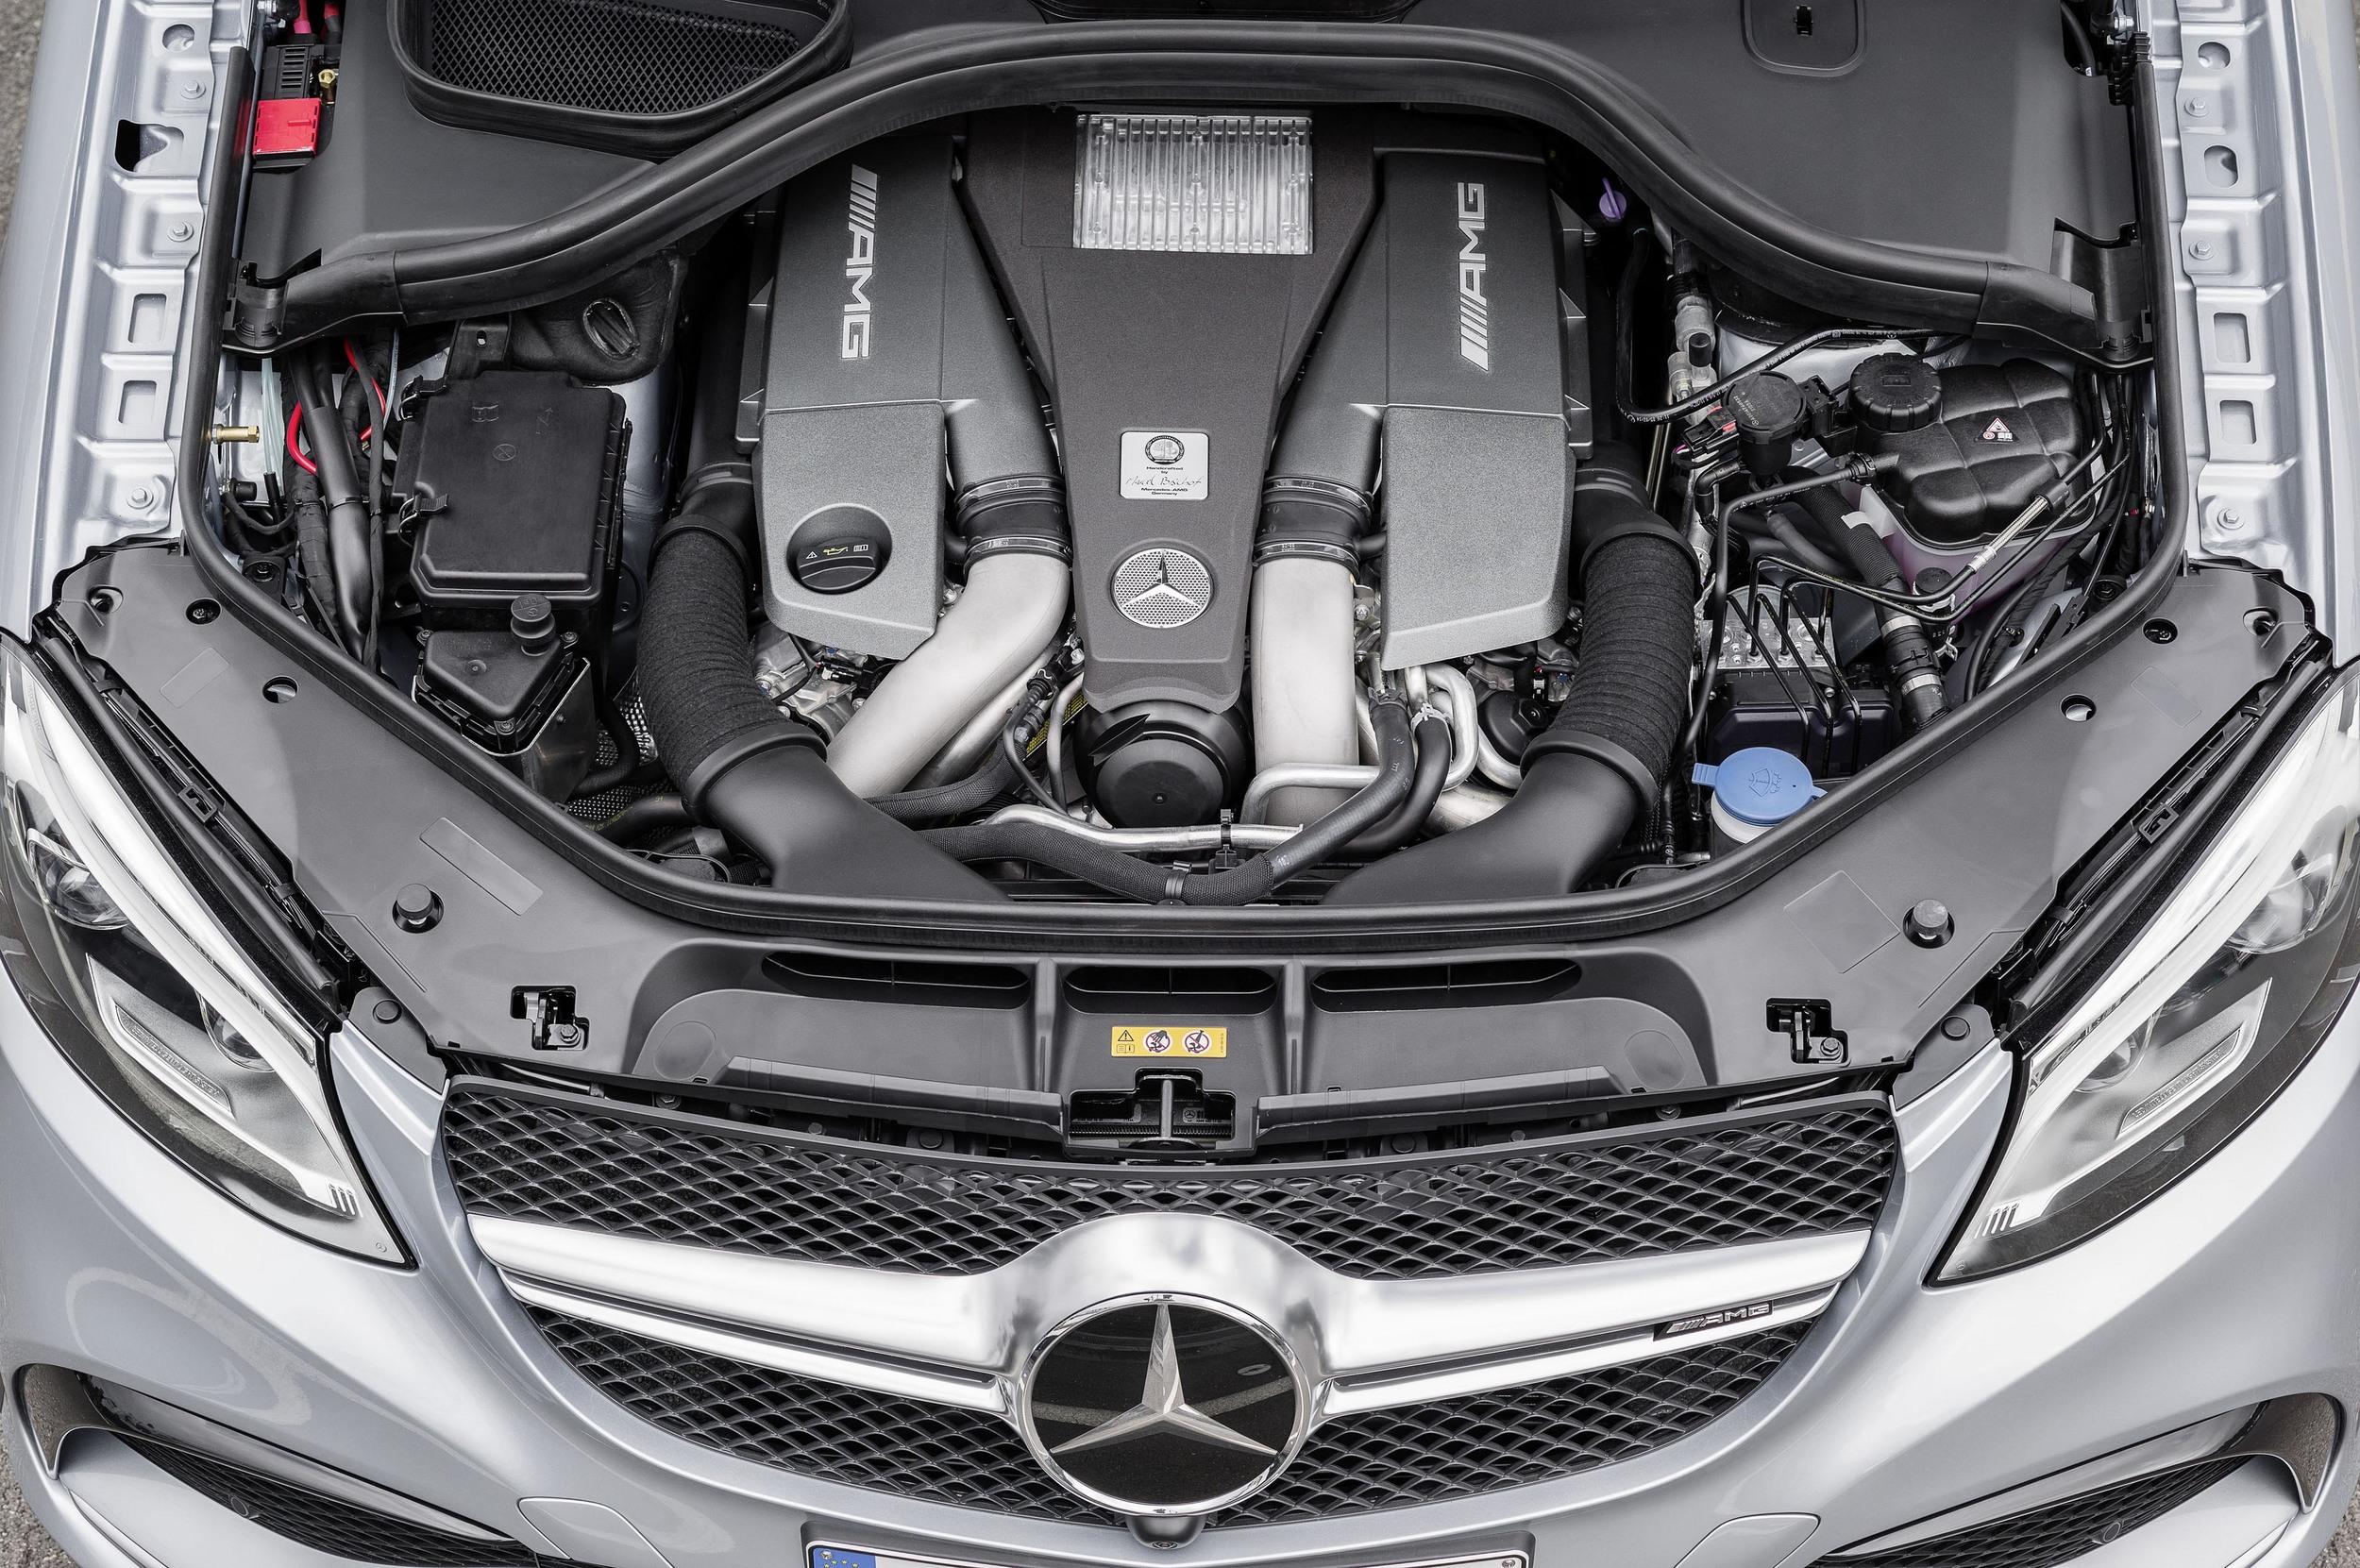 2016 Mercedes S Class - Engine